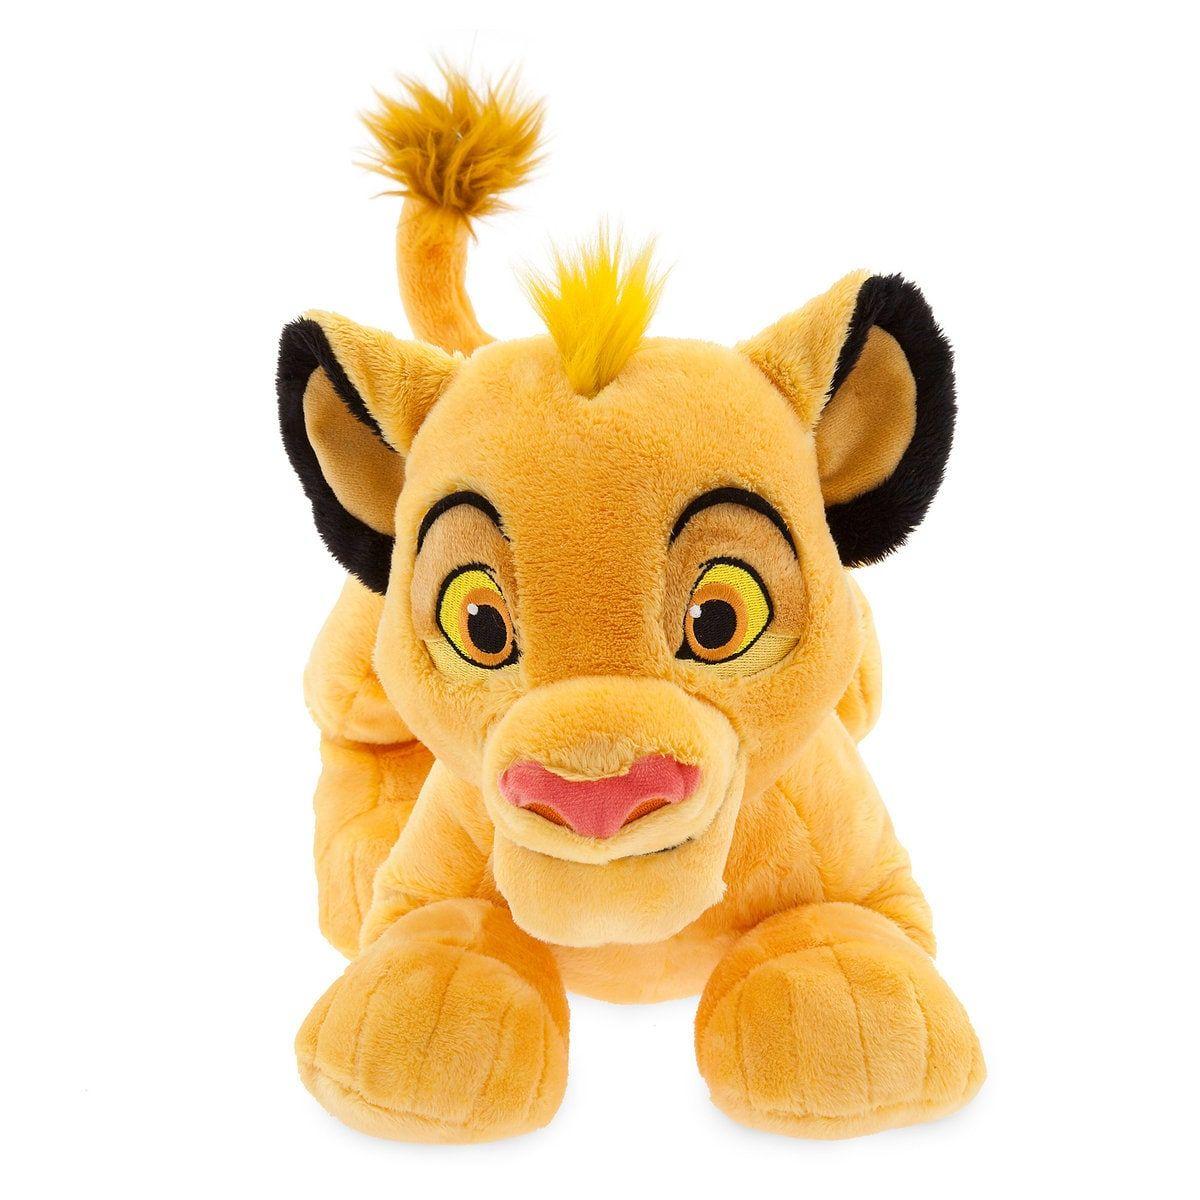 Simba Plush The Lion King Medium 17 Lion King Simba